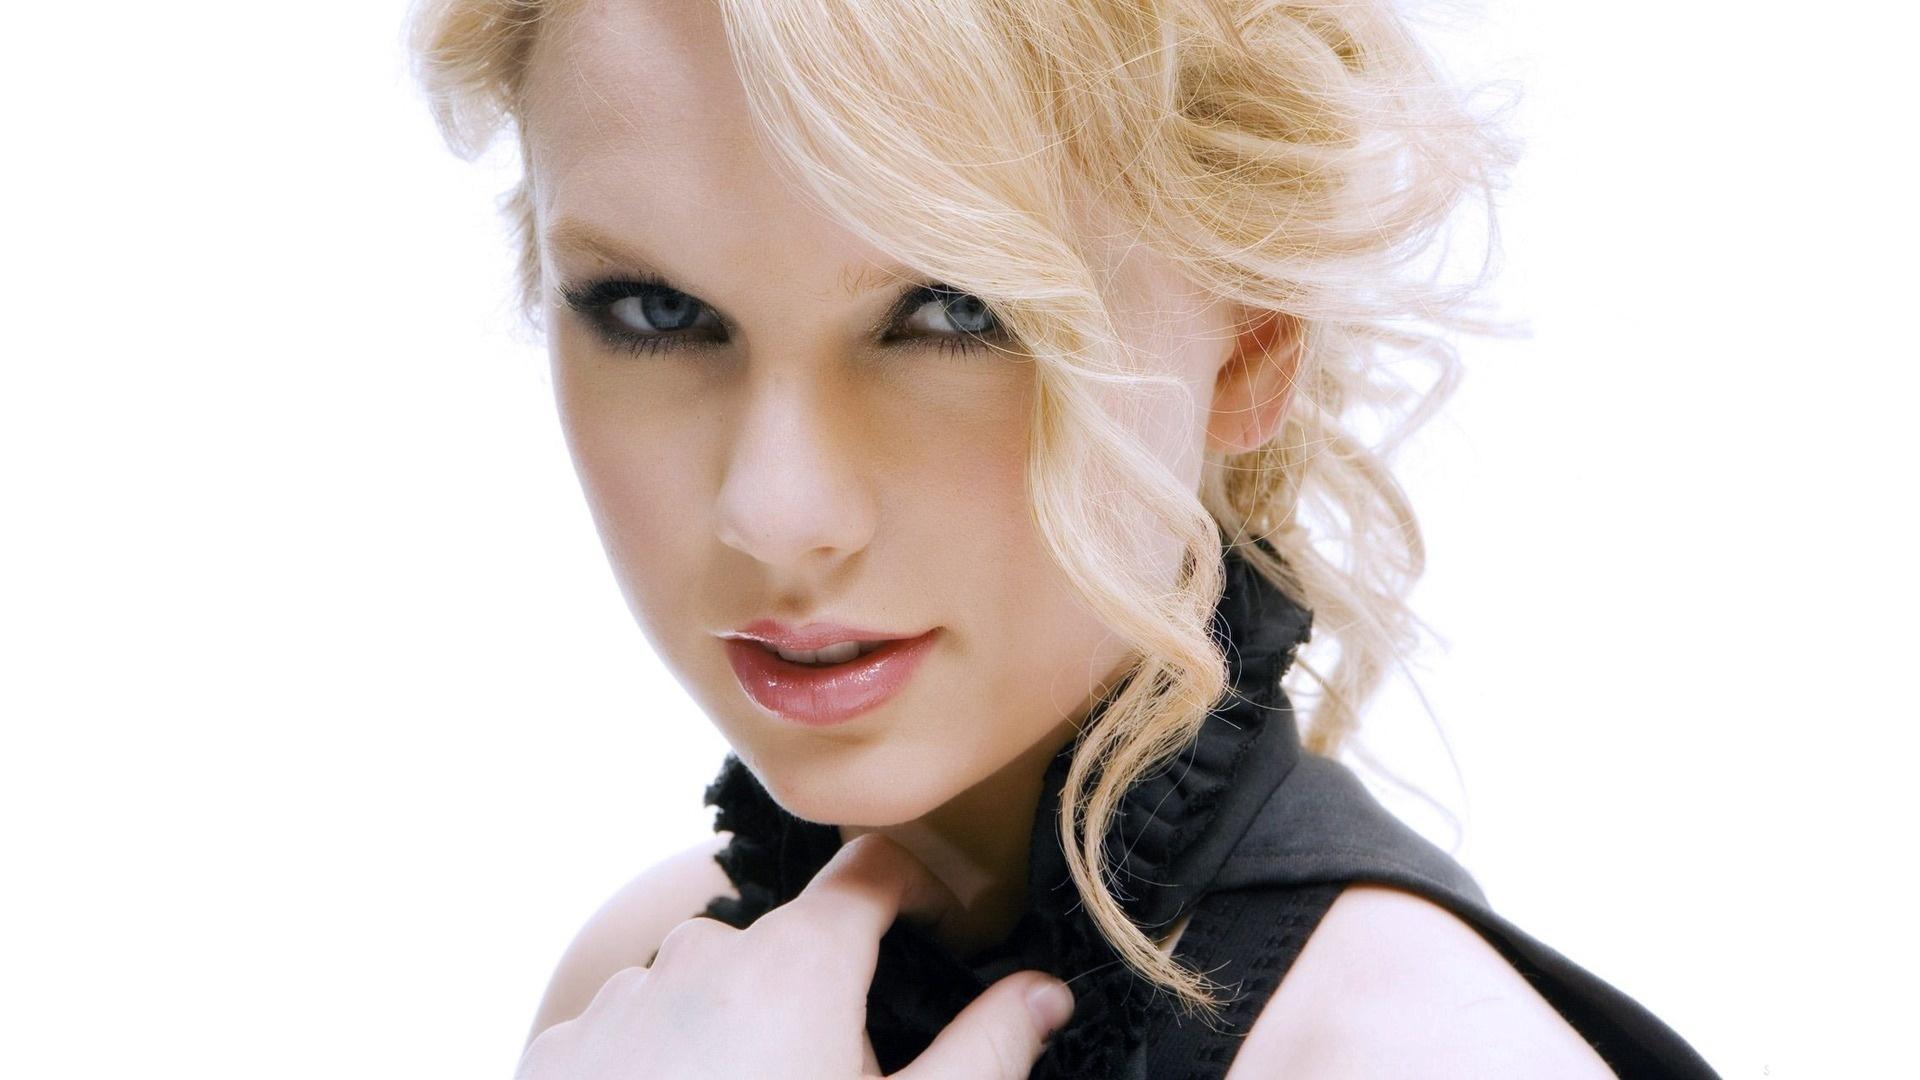 taylor swift, секси, певица, взгляд, губки, глаза, красота, блондинка